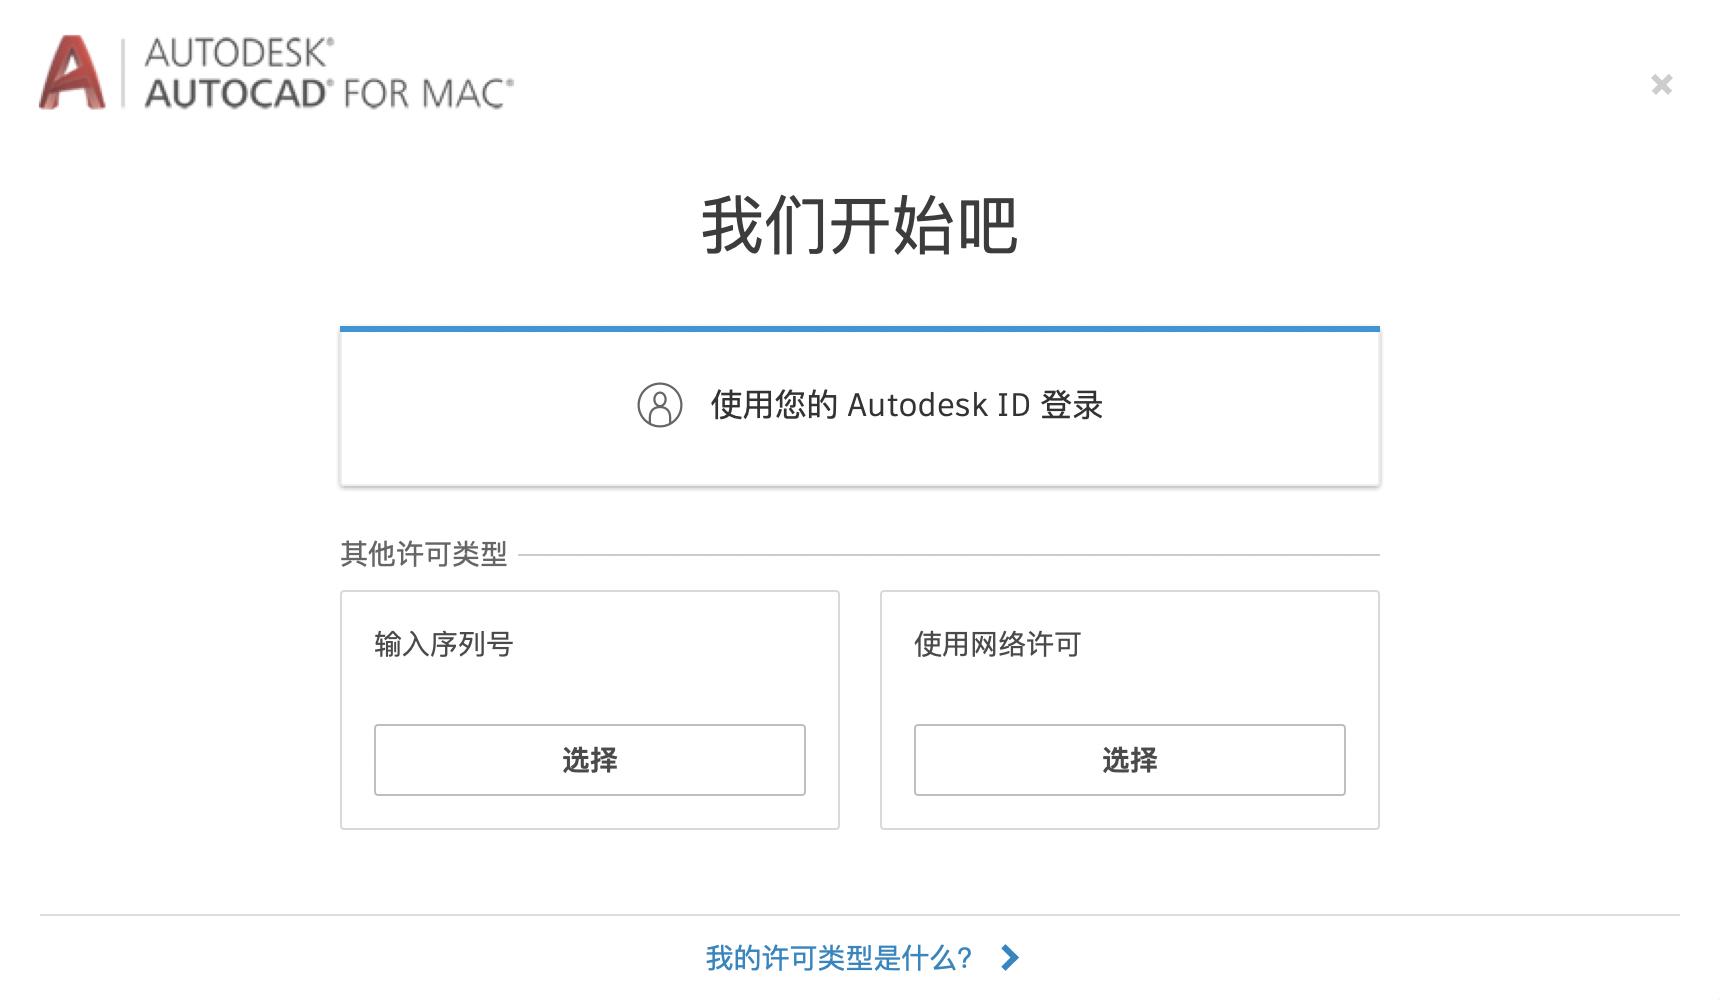 Autodesk AutoCAD 2021.1 For Mac 三维设计软件中文破解版支持M1